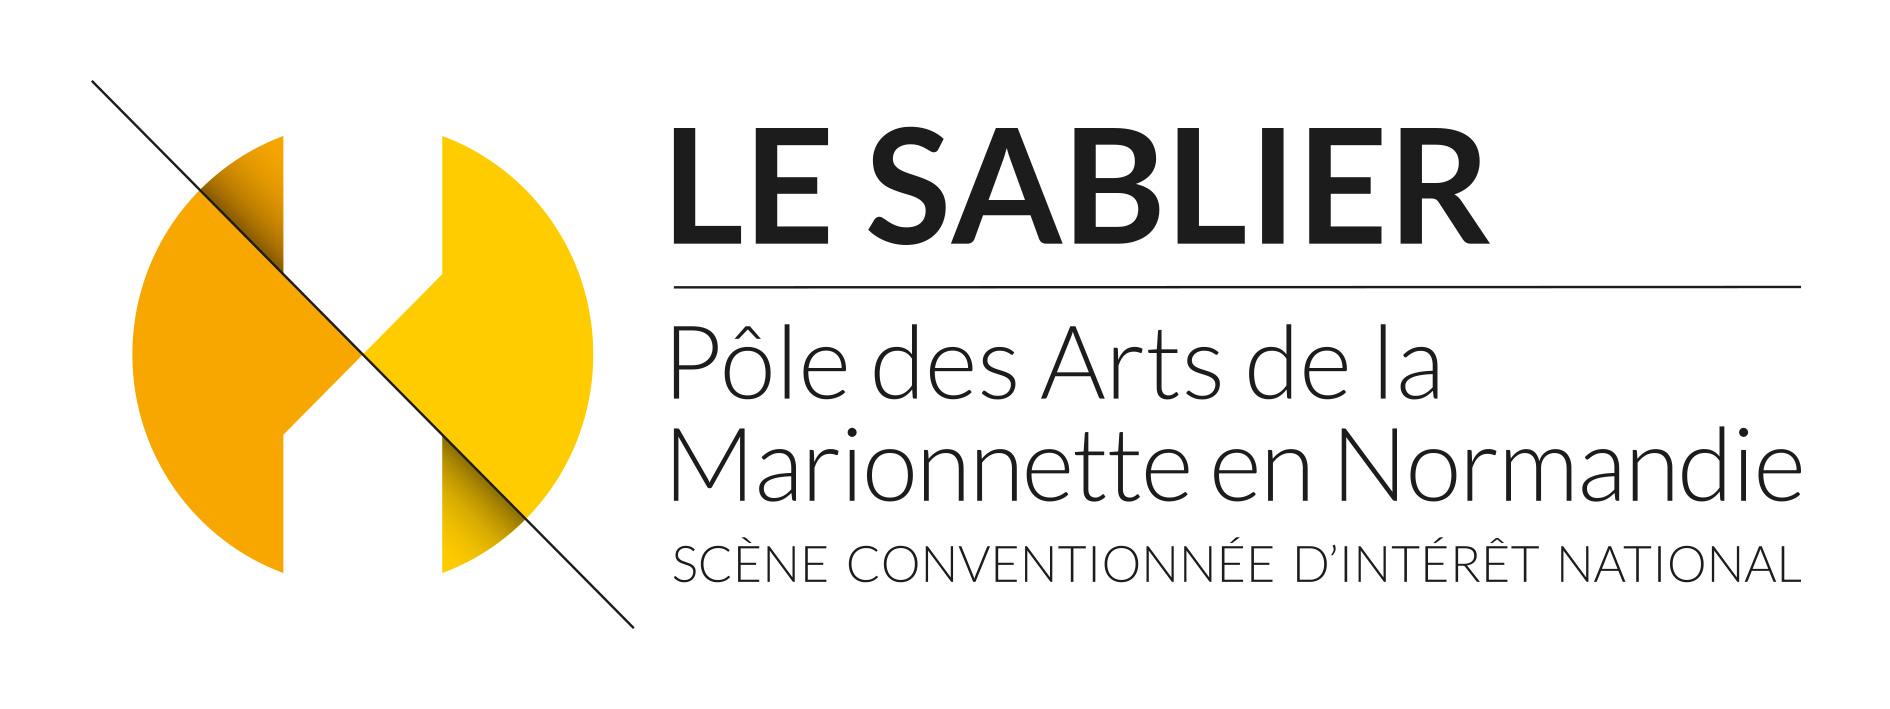 Logo Le Sablier, Ifs